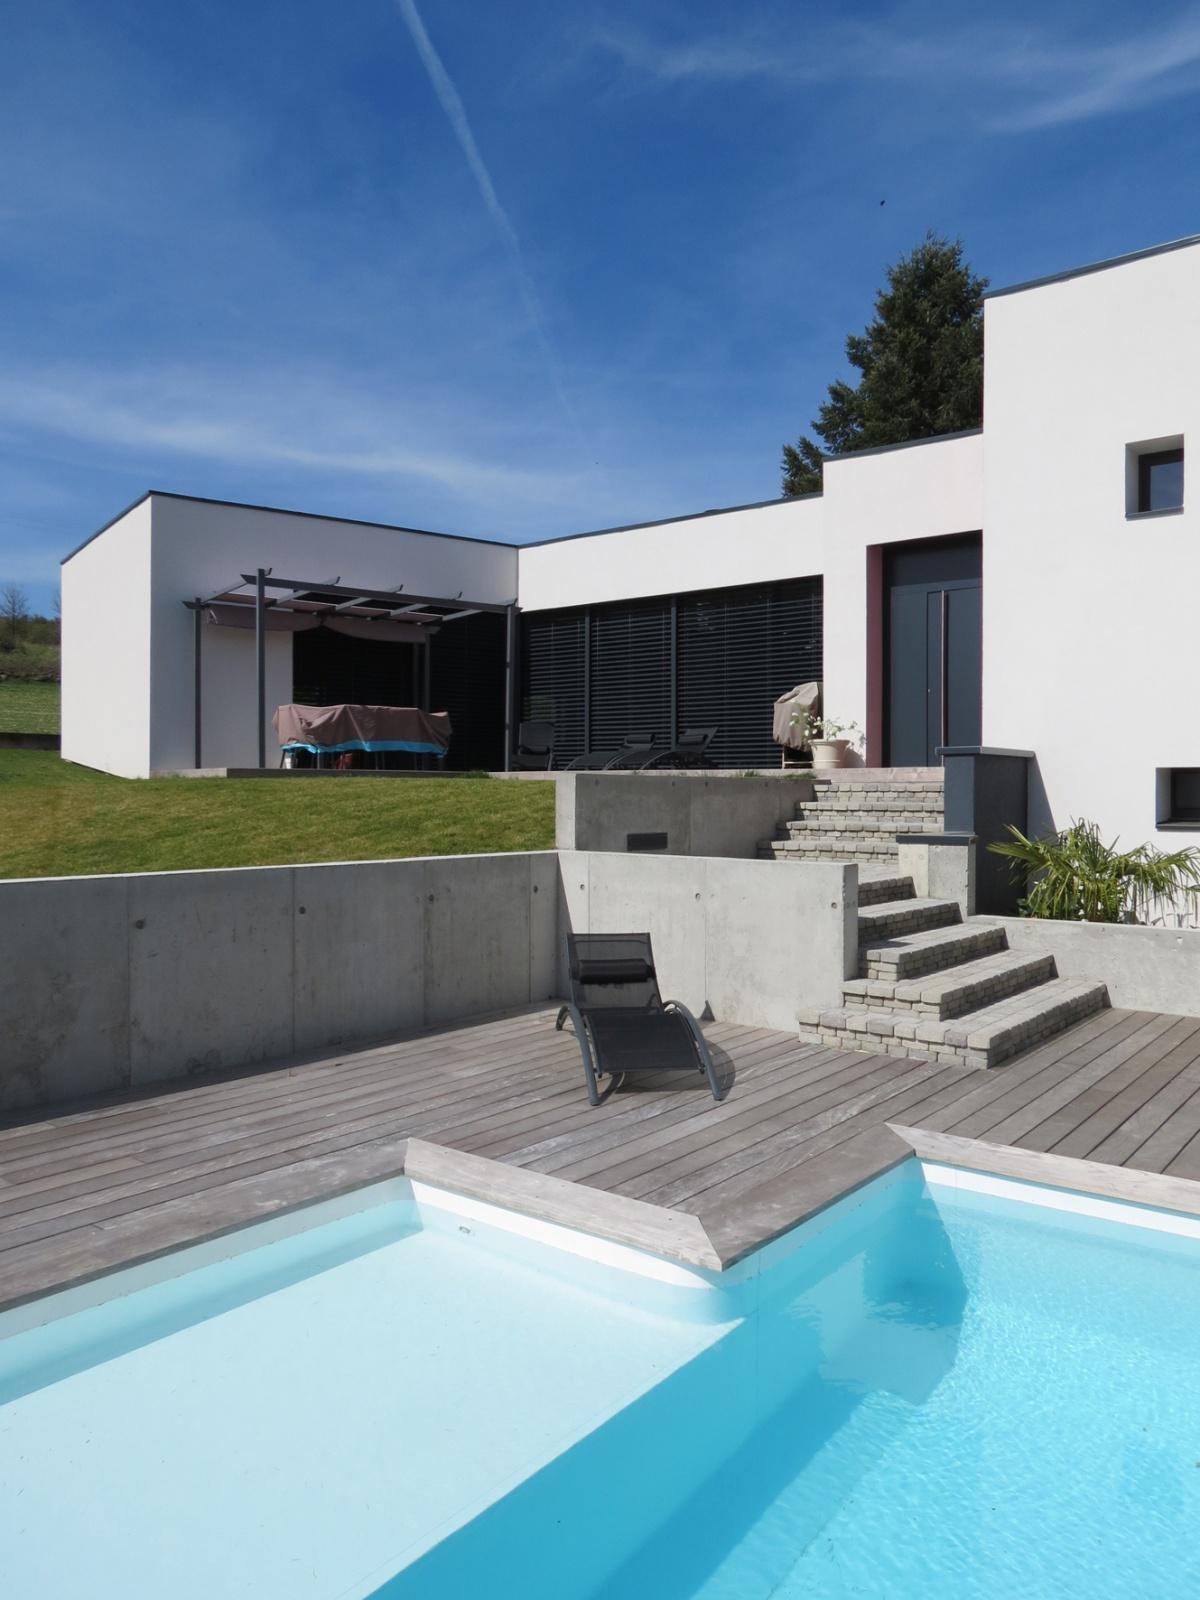 Maison contemporaine : IMG_1789 copie.jpg